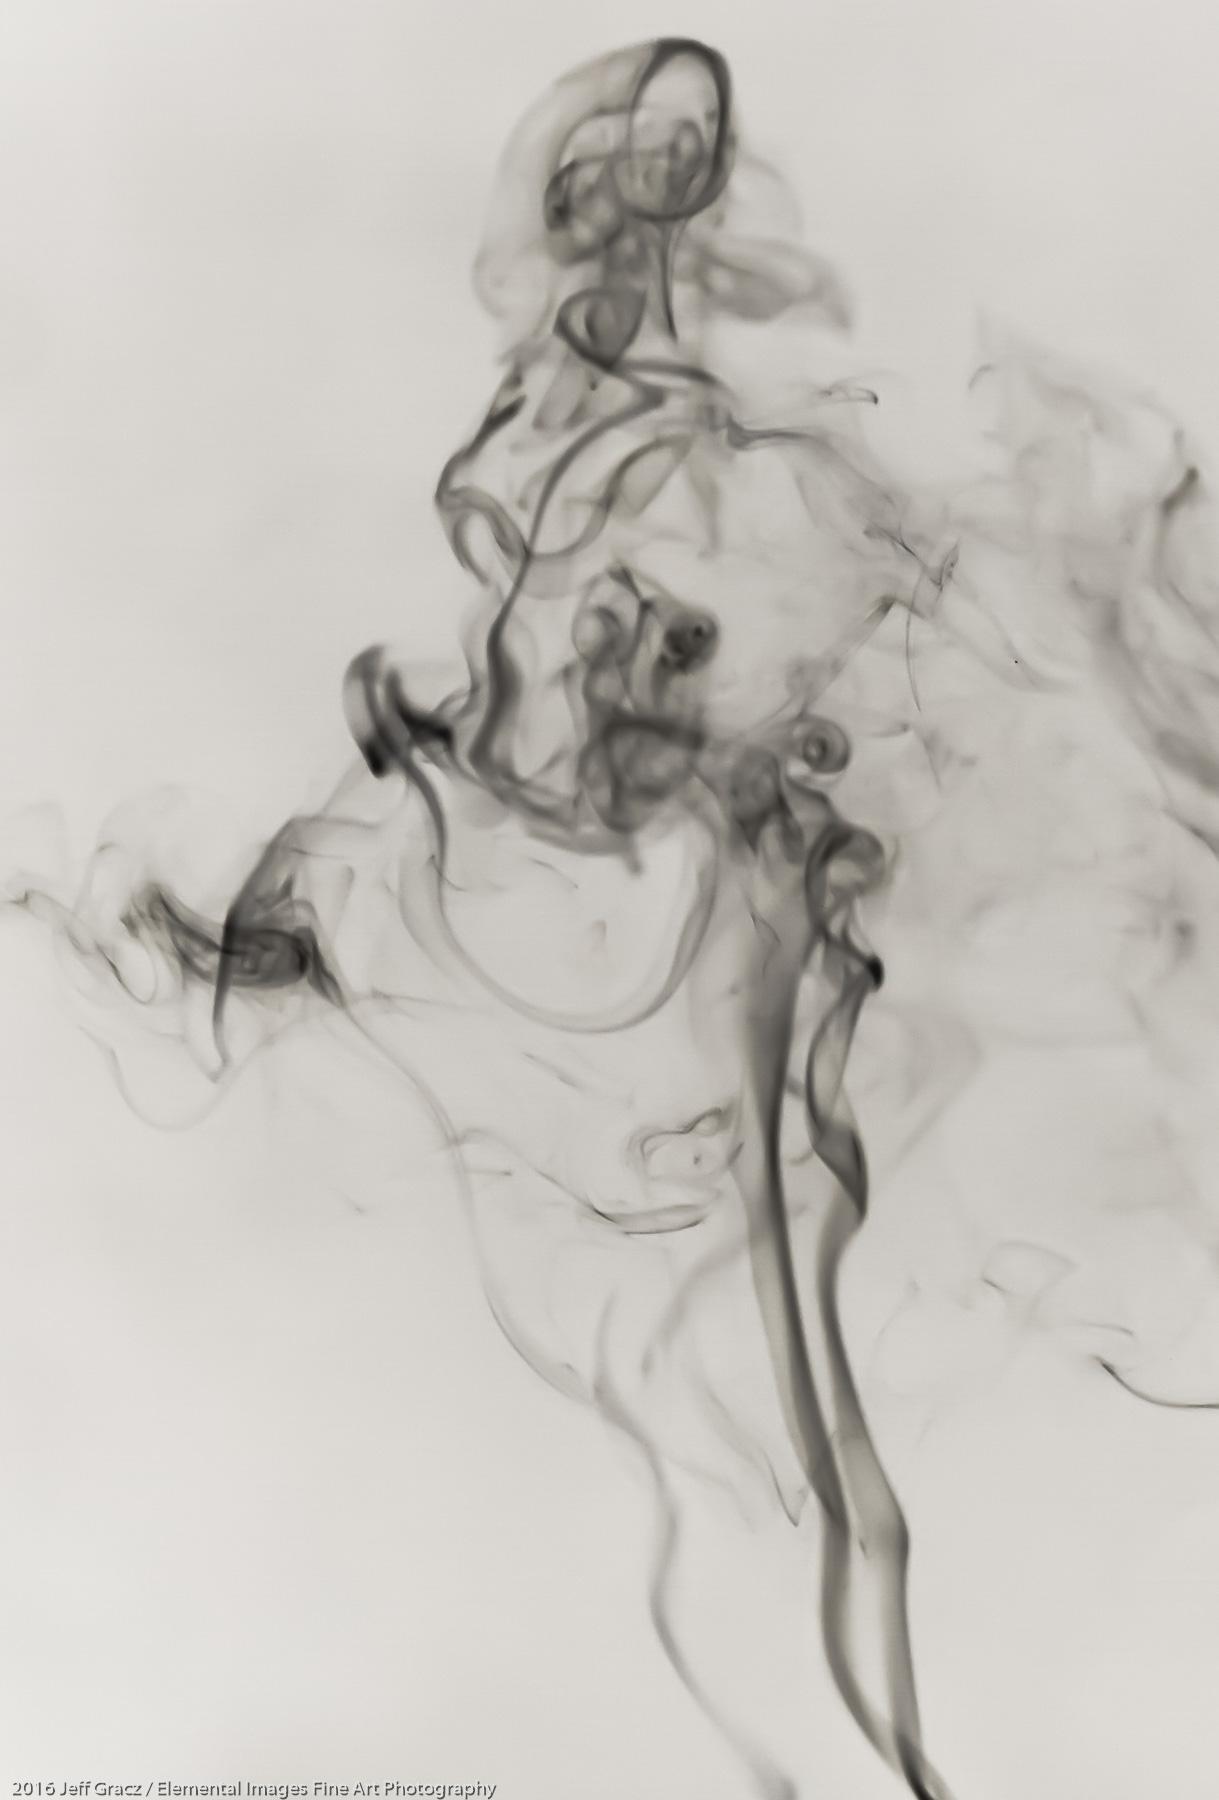 Smoke 23 | Vancouver | WA | USA - © 2016 Jeff Gracz / Elemental Images Fine Art Photography - All Rights Reserved Worldwide